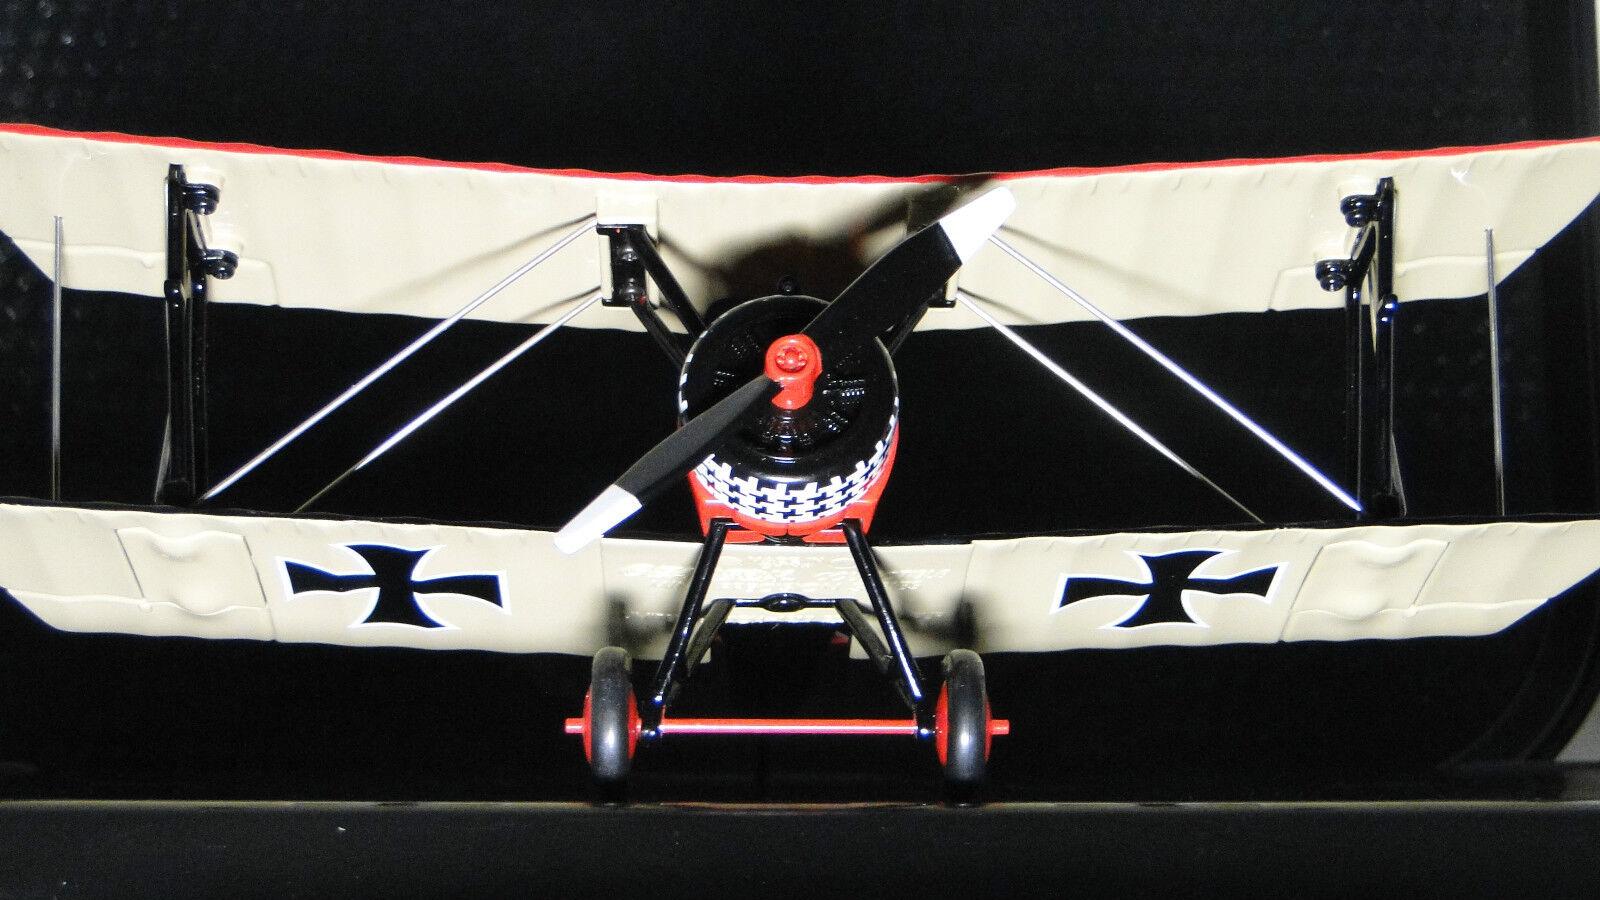 1 Red Barron Airplane Aircraft Diecast Model Military Vintage WW1 War Bird 48